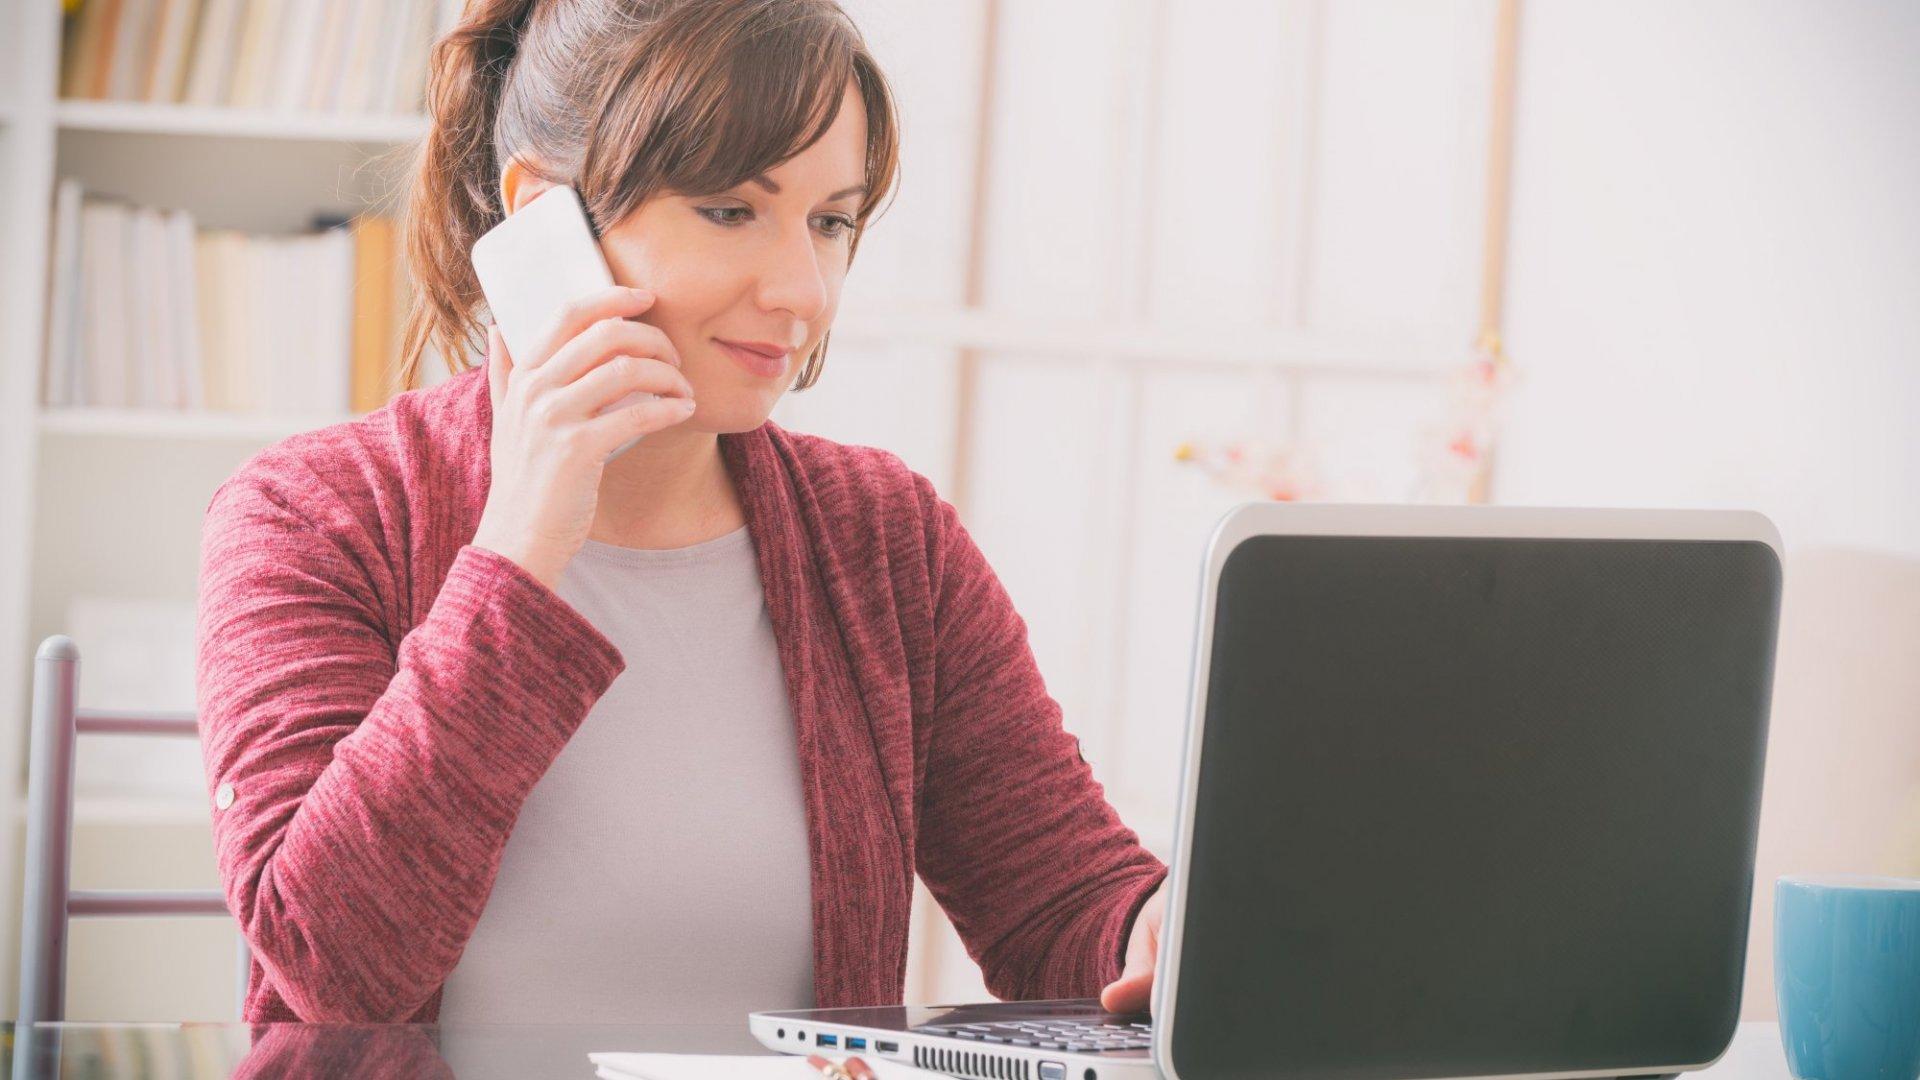 3 Killer Ways to Build a Successful Remote Company